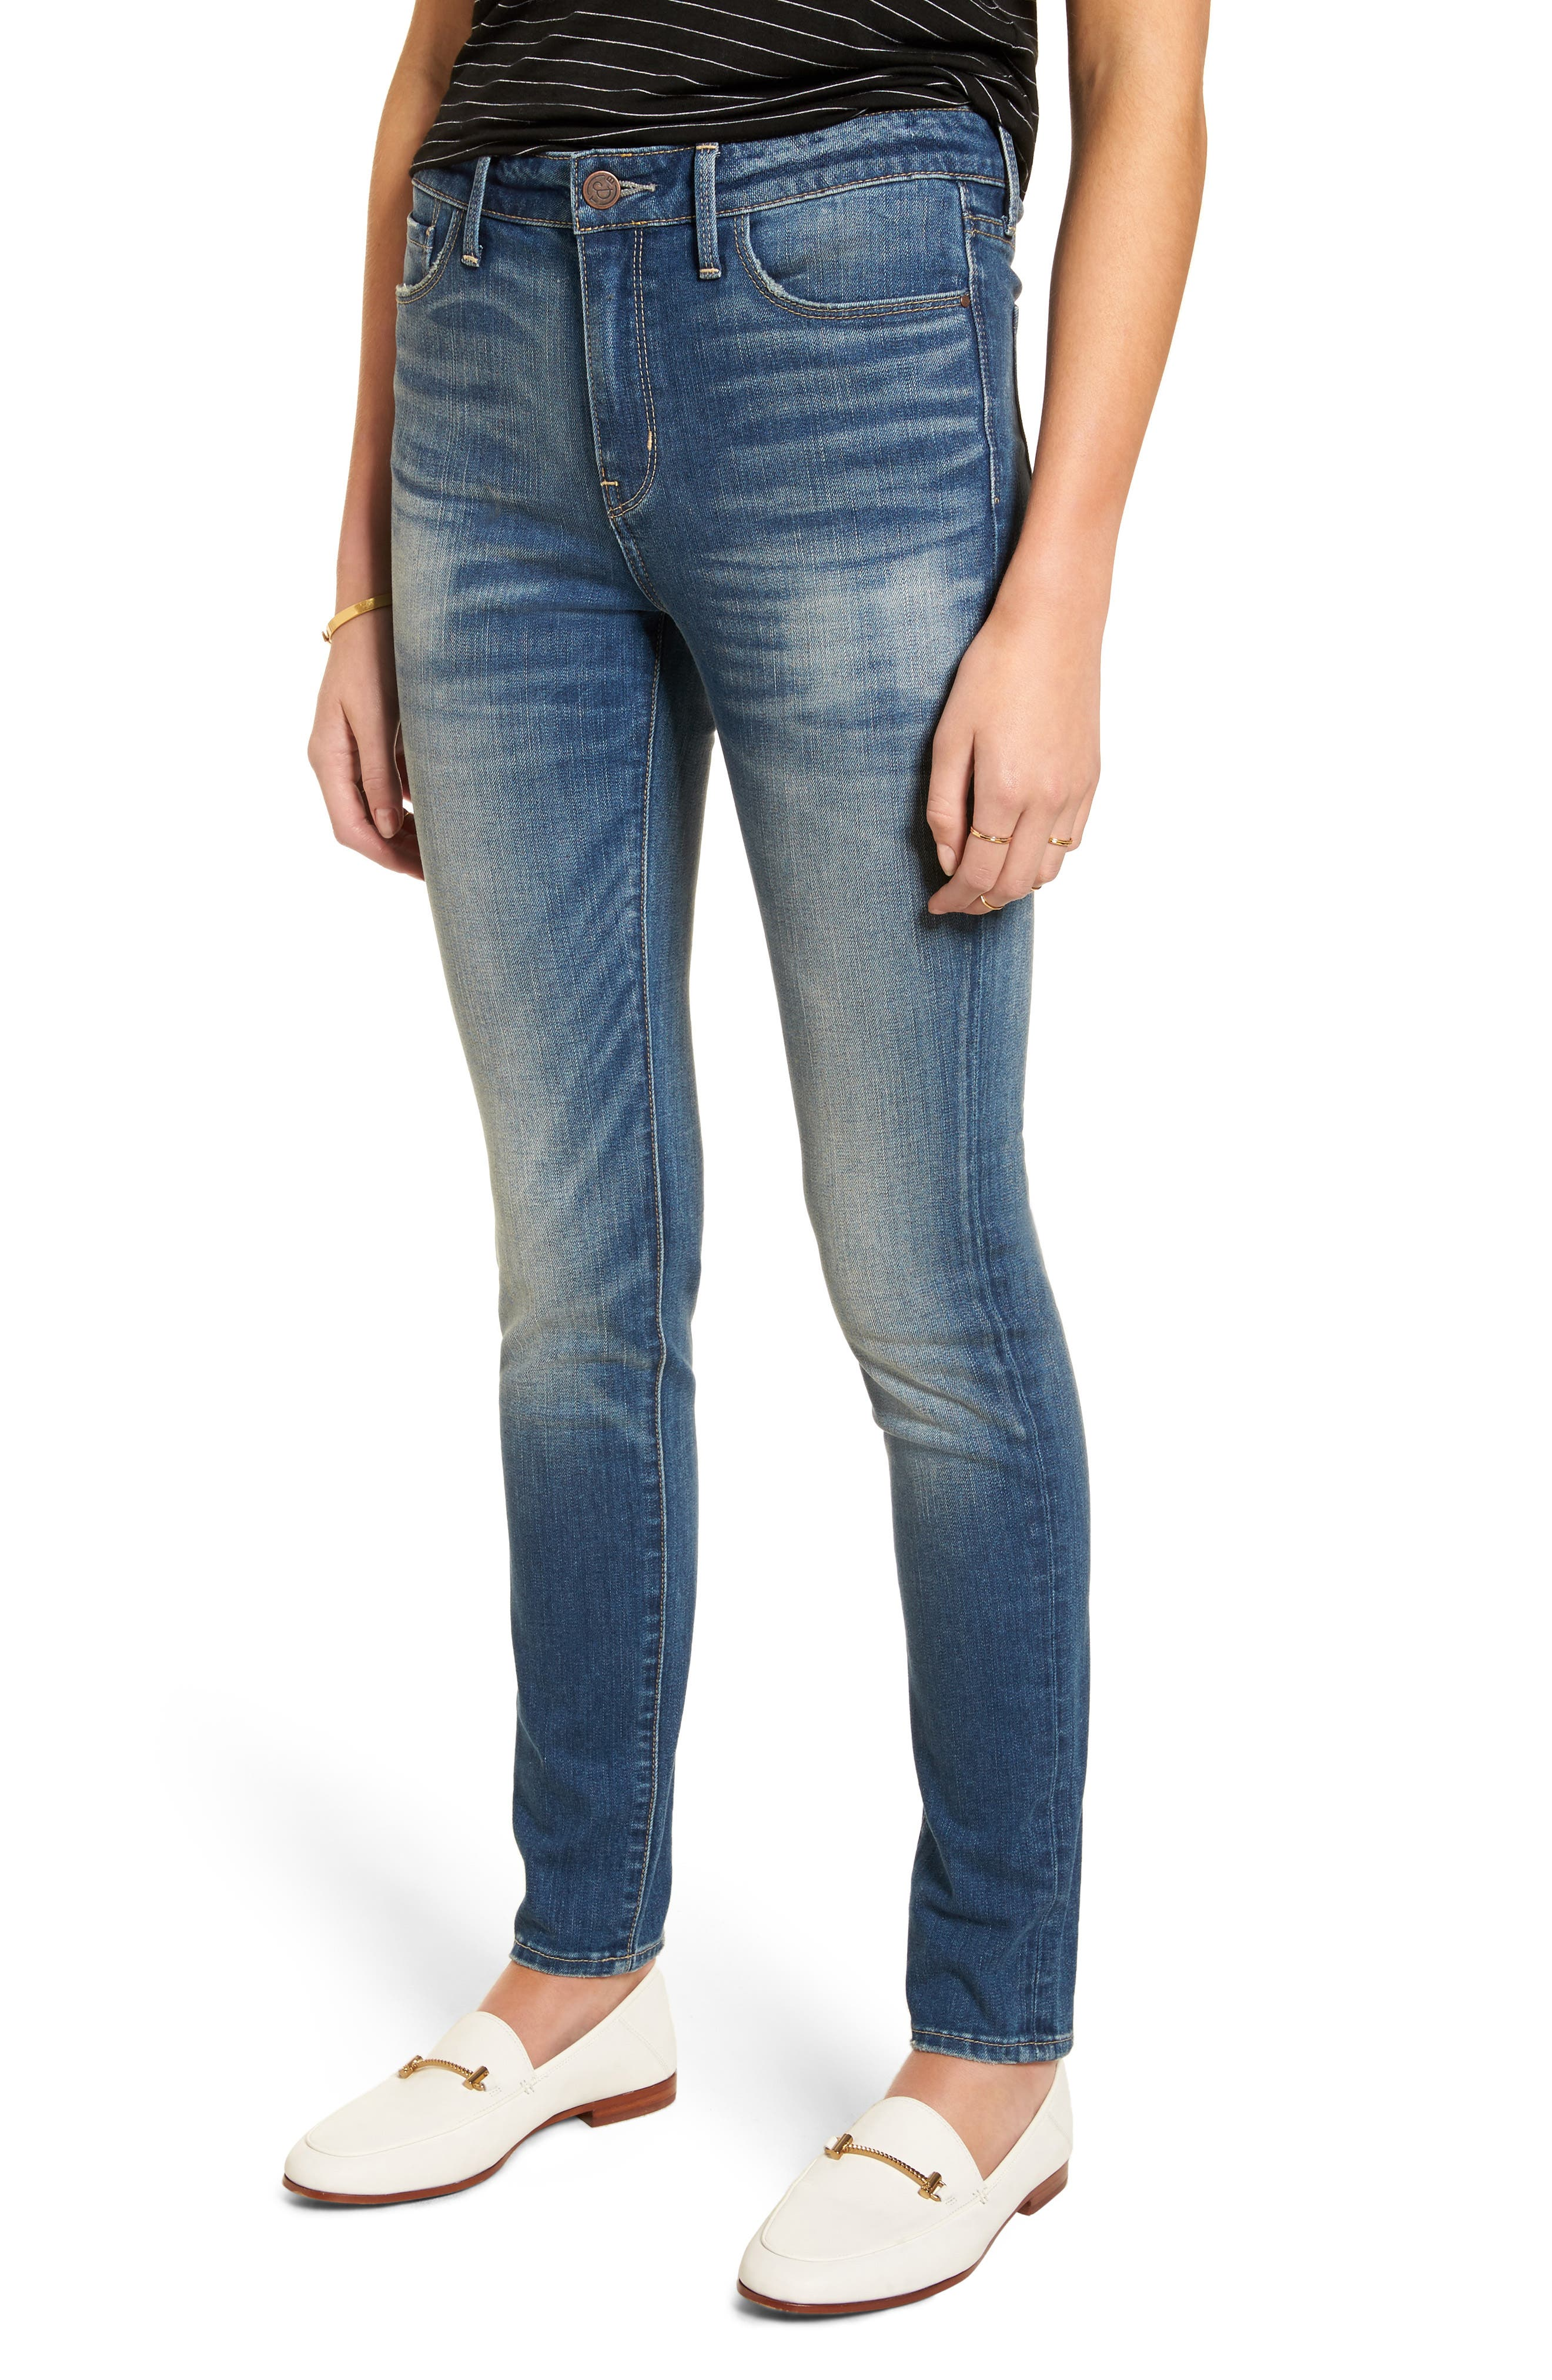 Treasure & Bond High Waist Skinny Jeans (Rain Medium Worn)